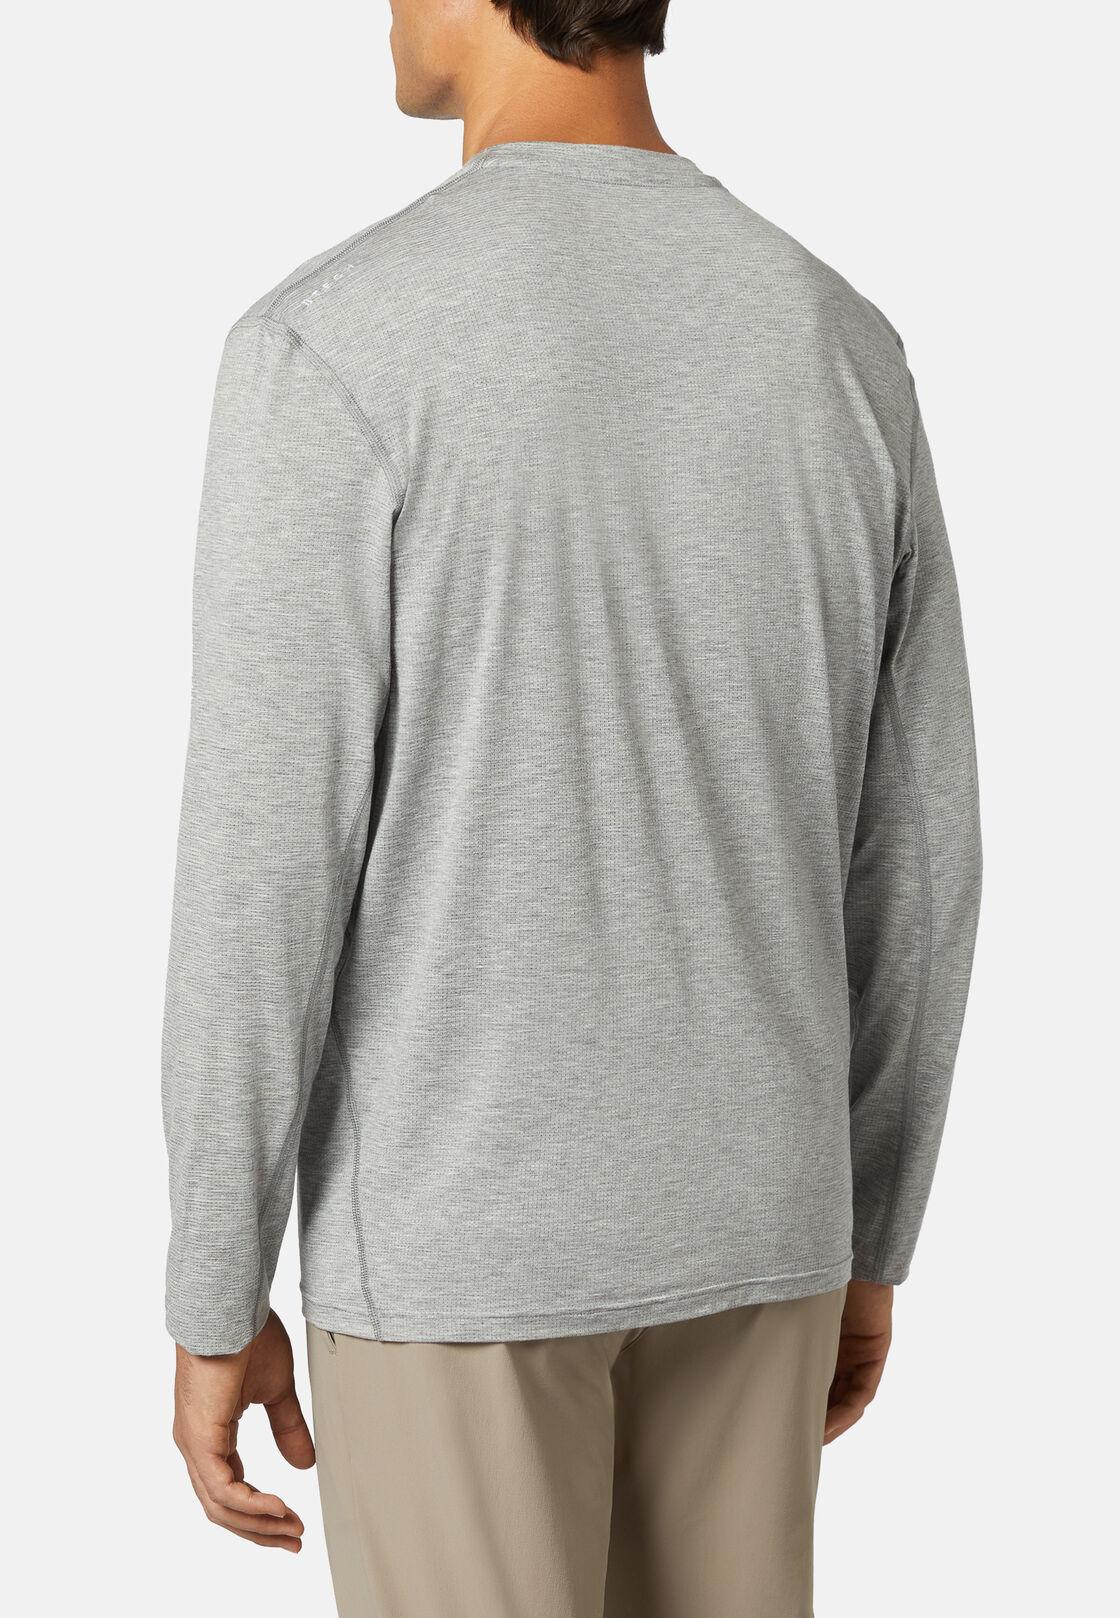 T-shirt aus elastischem modal carbon lange ärmel, Grau, hi-res